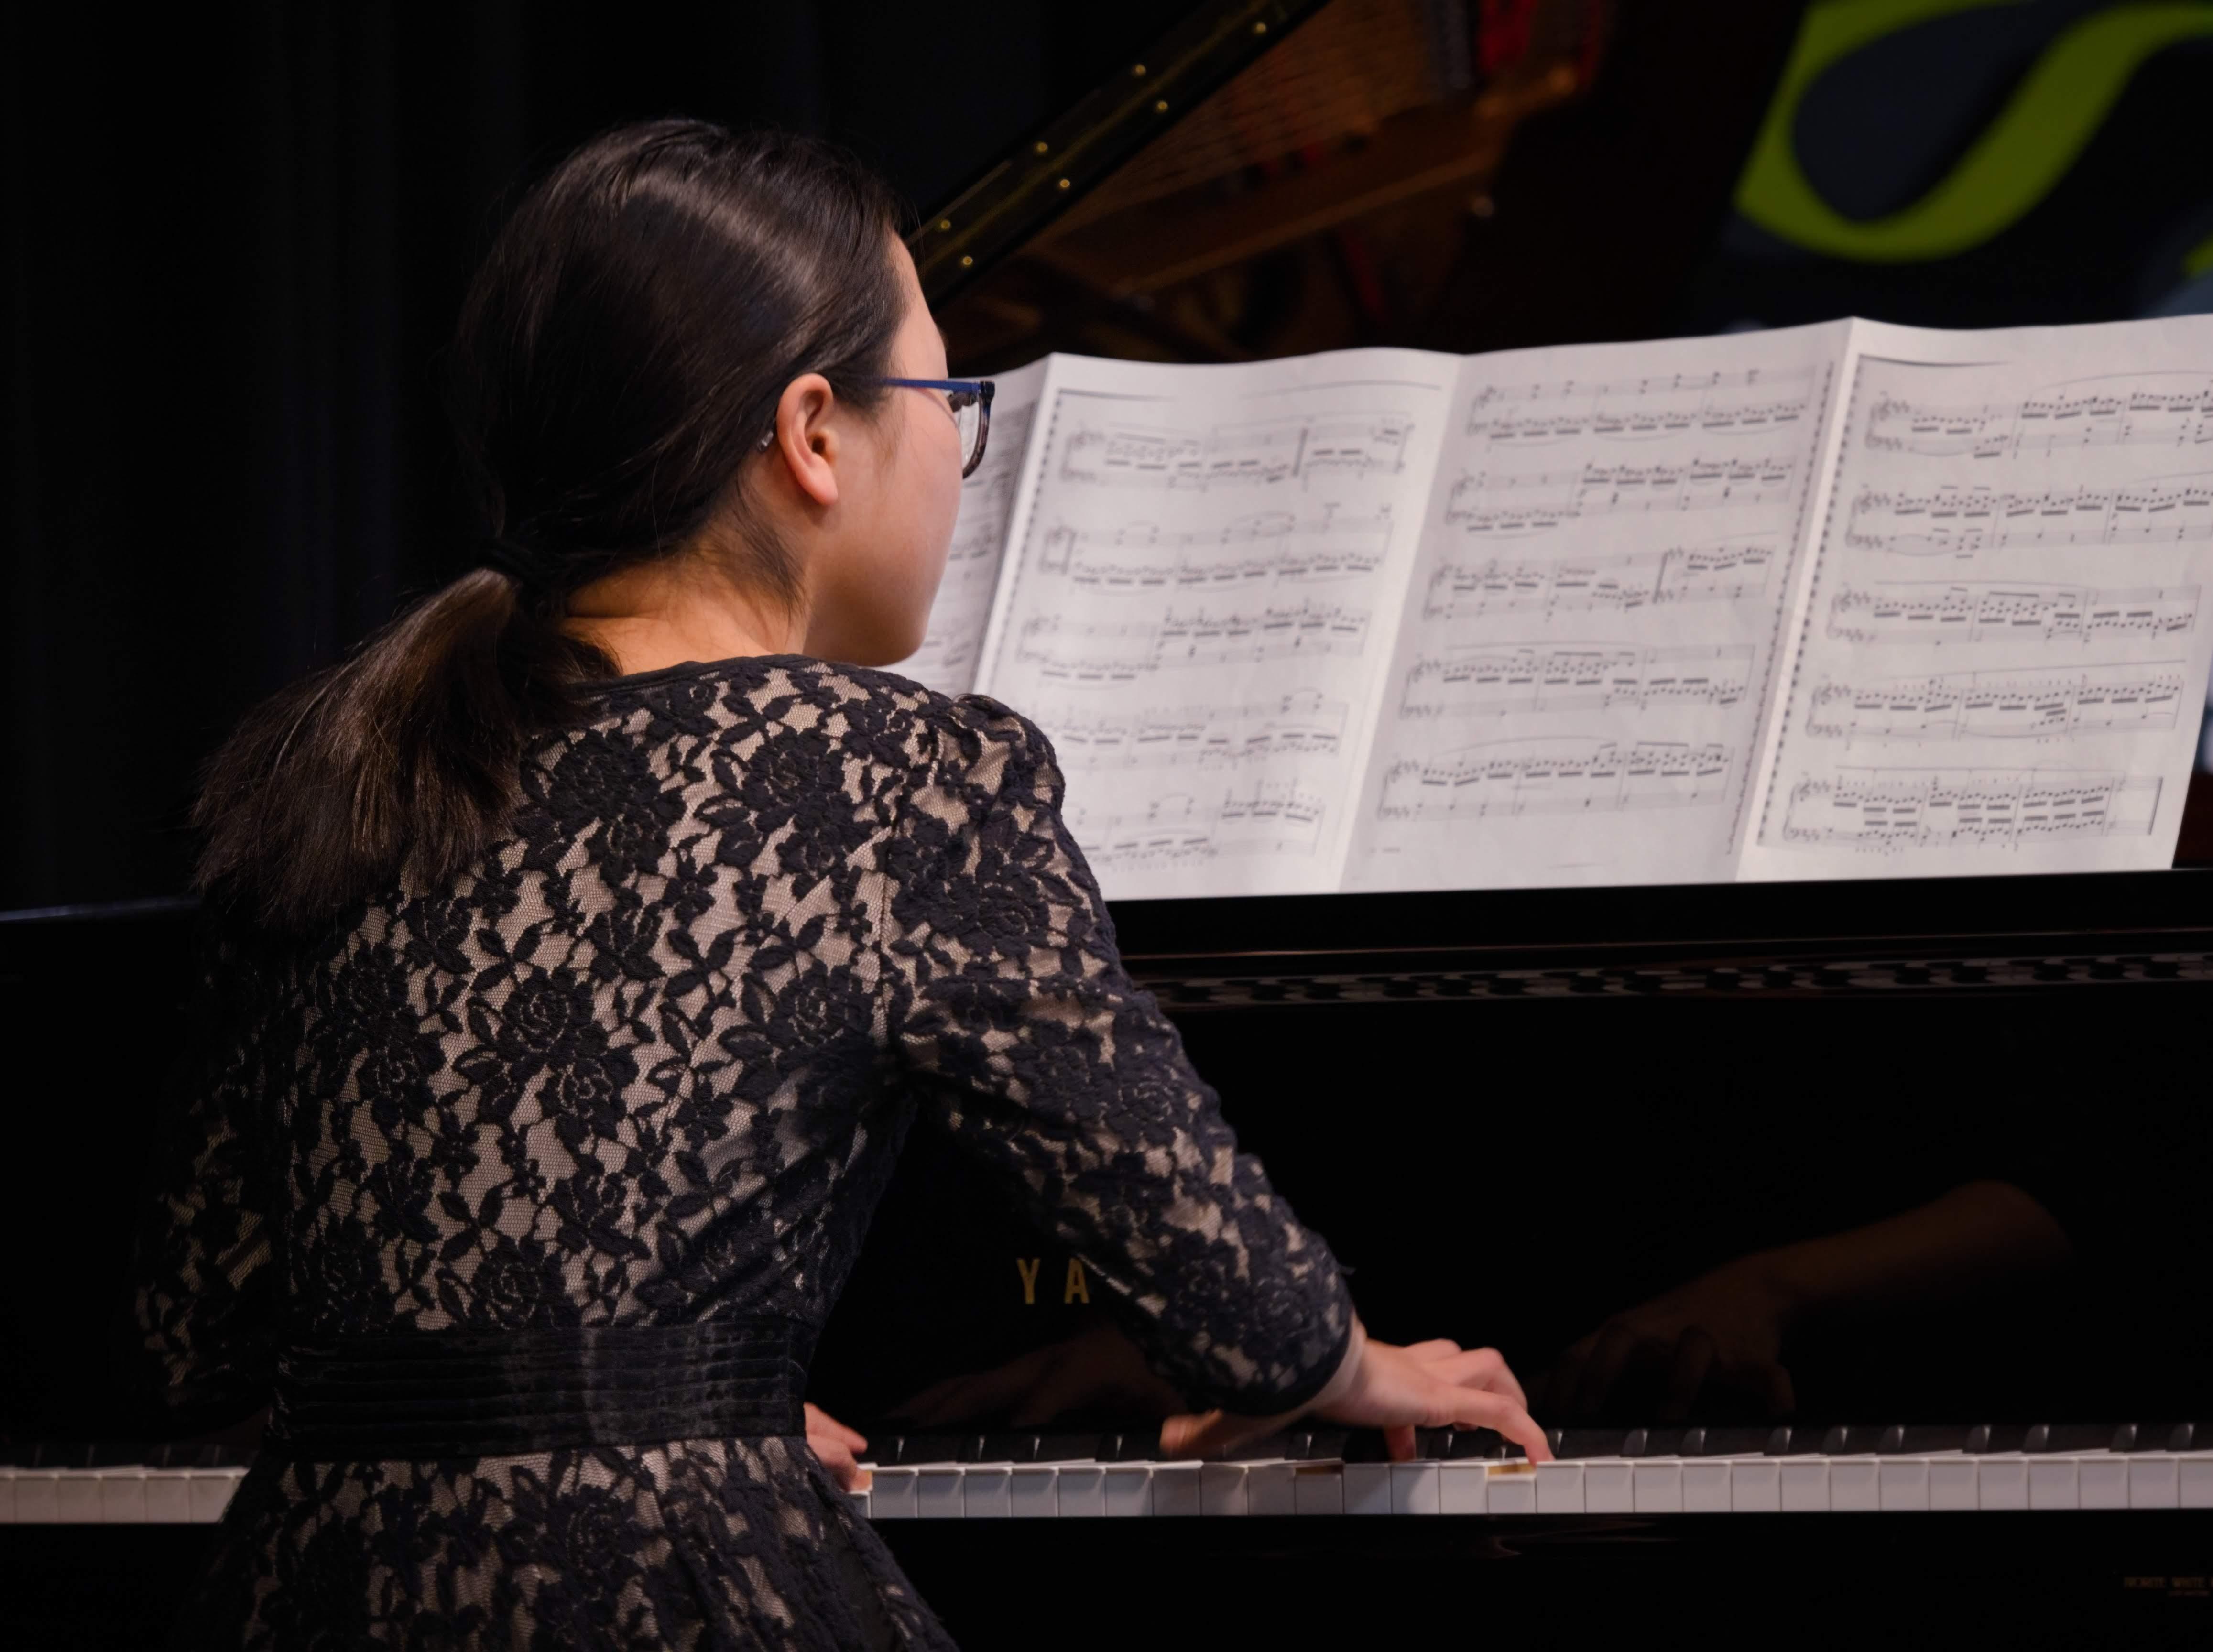 WGE Pianoforte Day 3 Rachel Liang Chen Displays Her Skills on the Piano